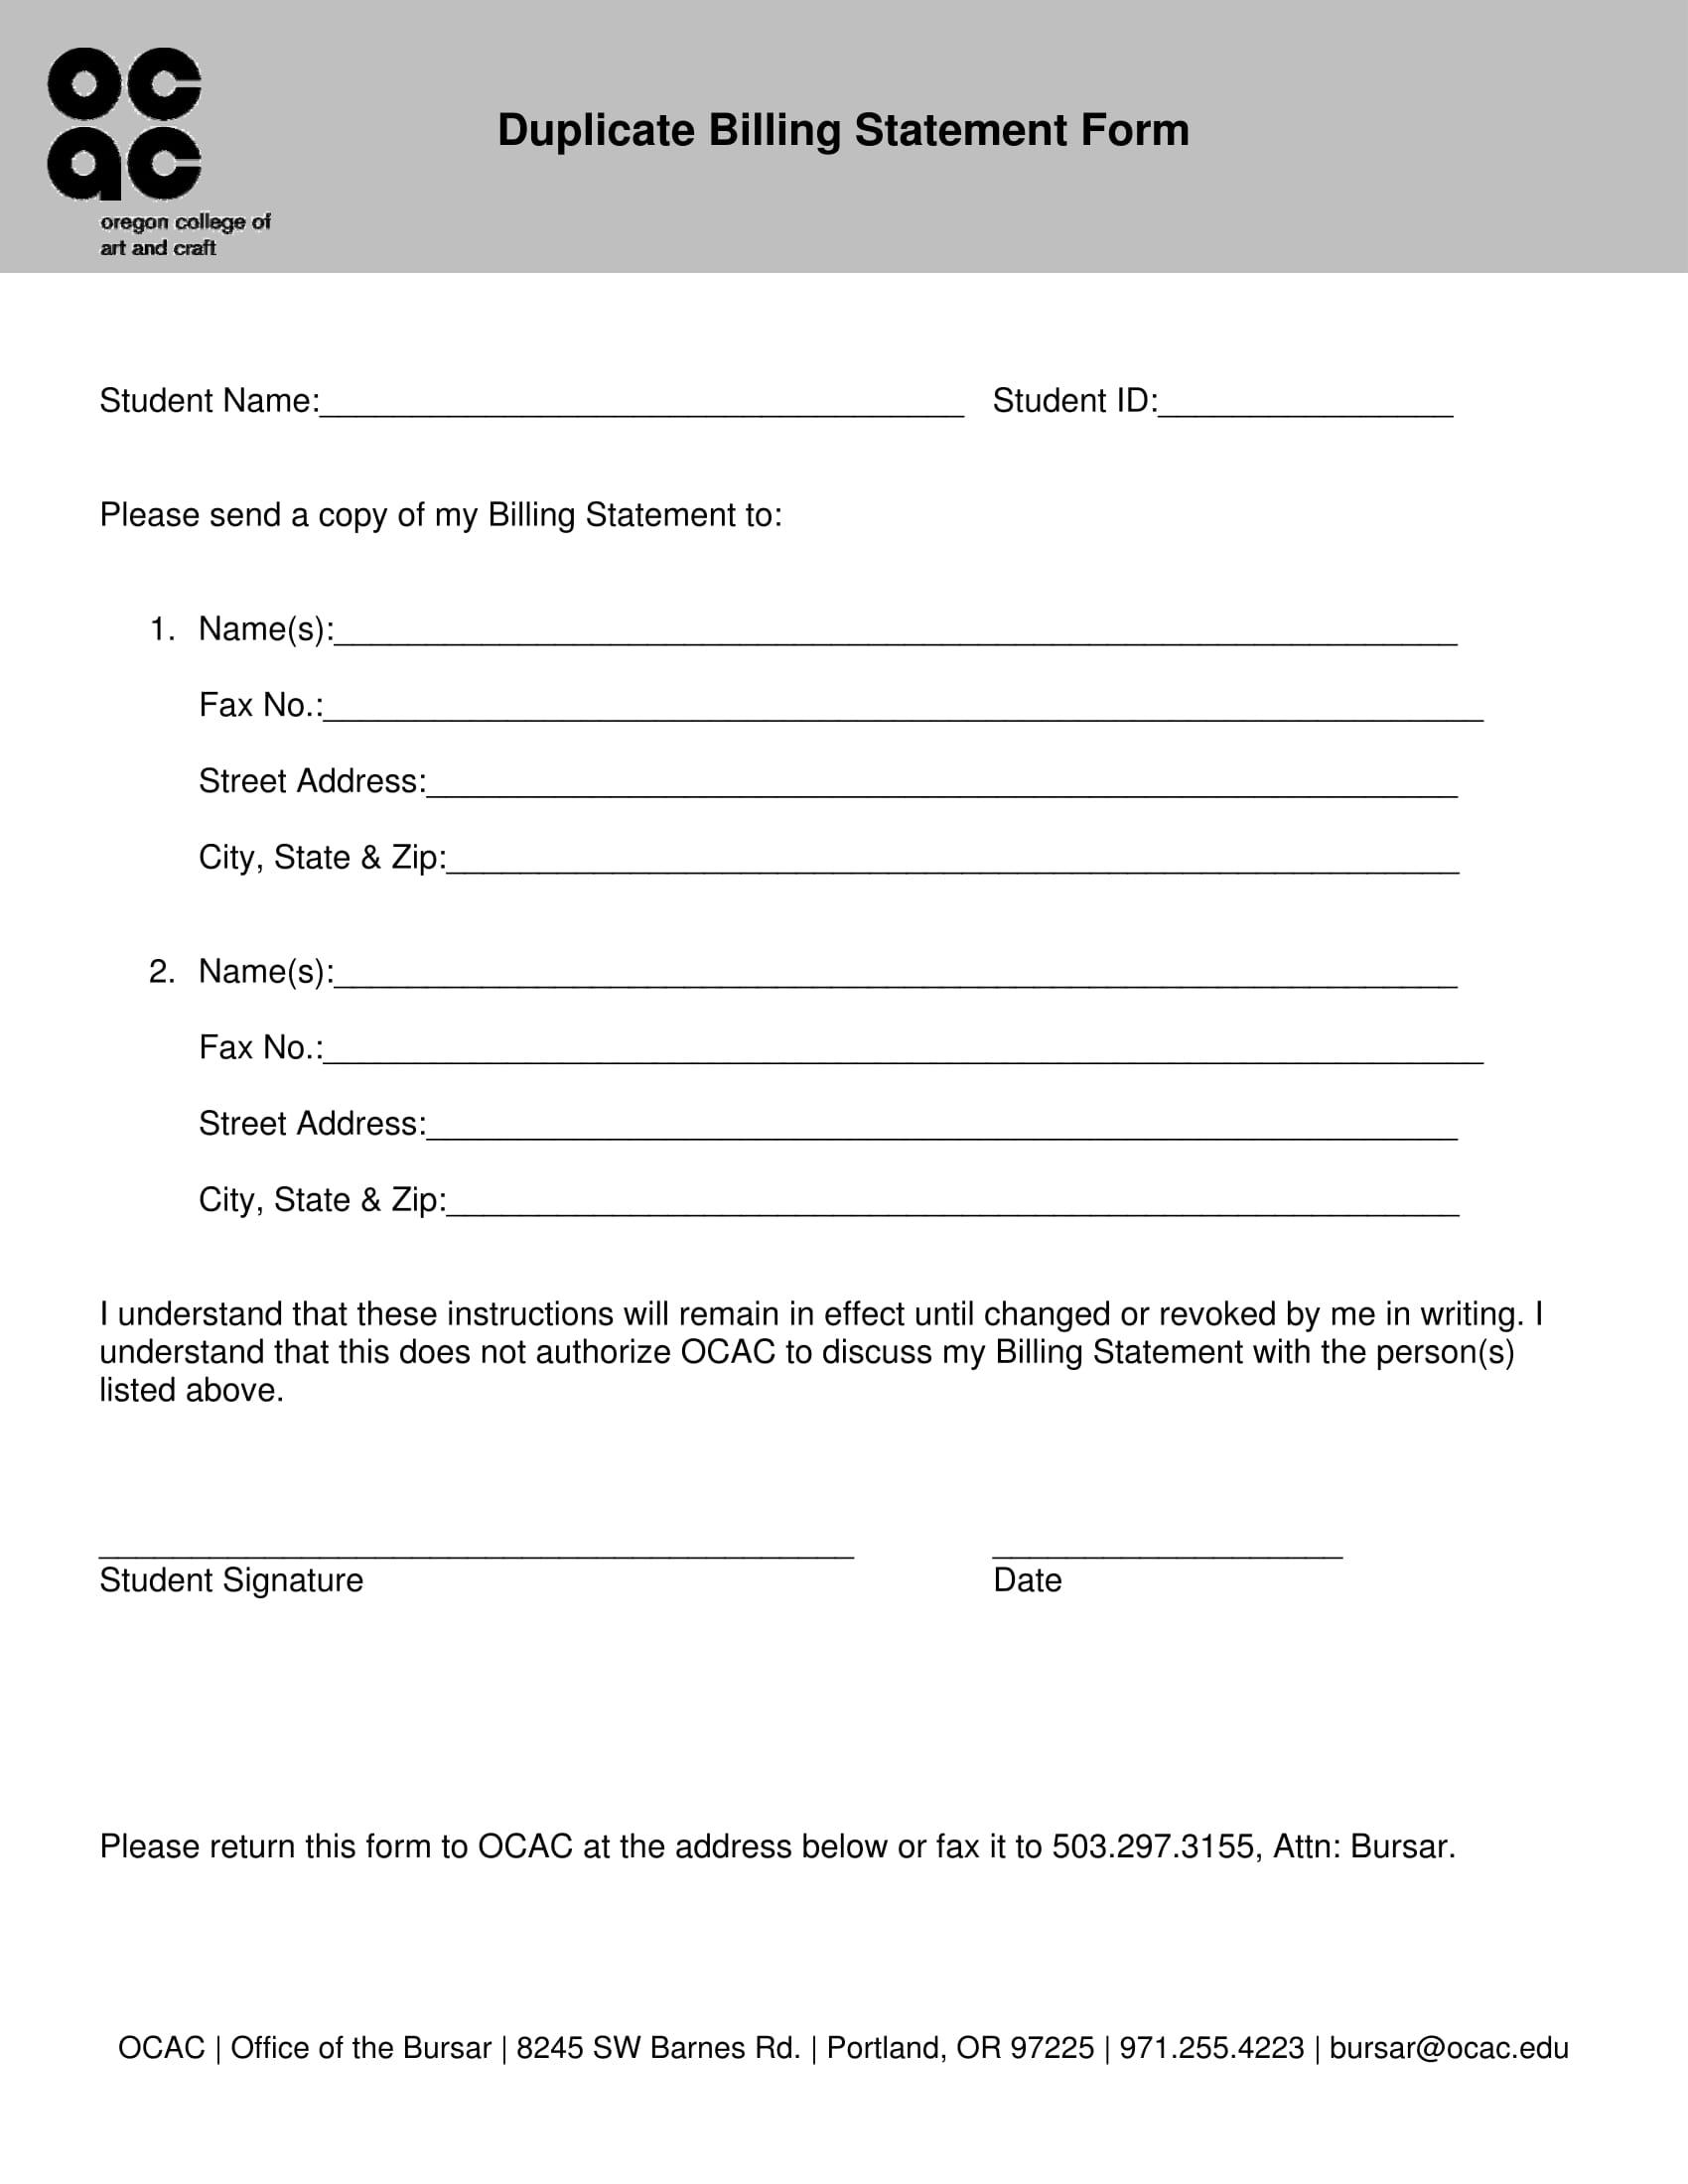 duplicate billing statement form 1